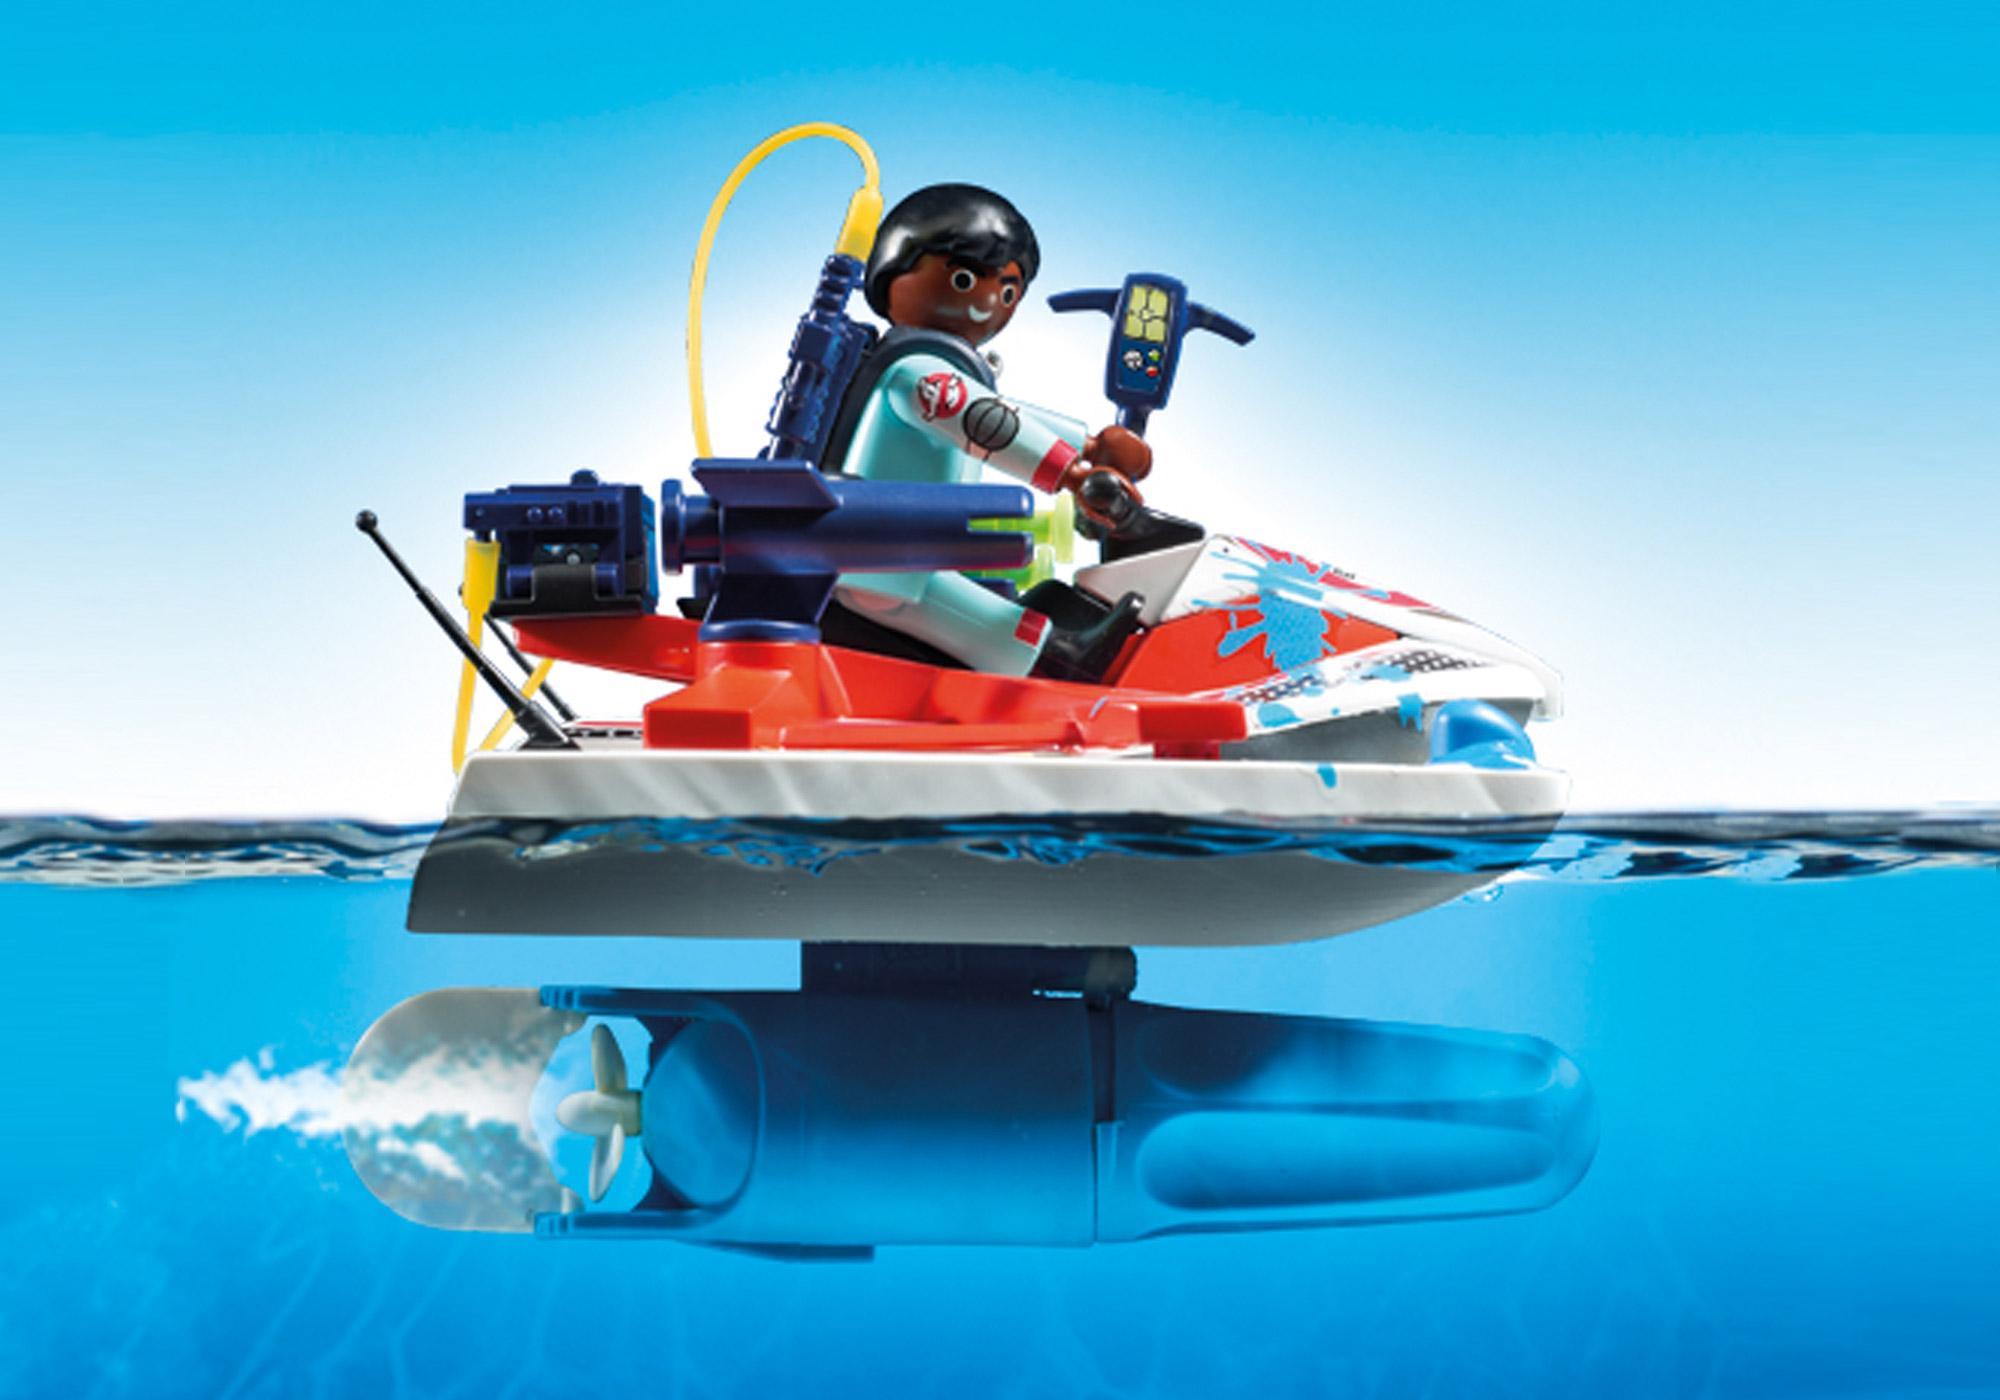 http://media.playmobil.com/i/playmobil/9387_product_extra3/Zeddemore med vandscooter